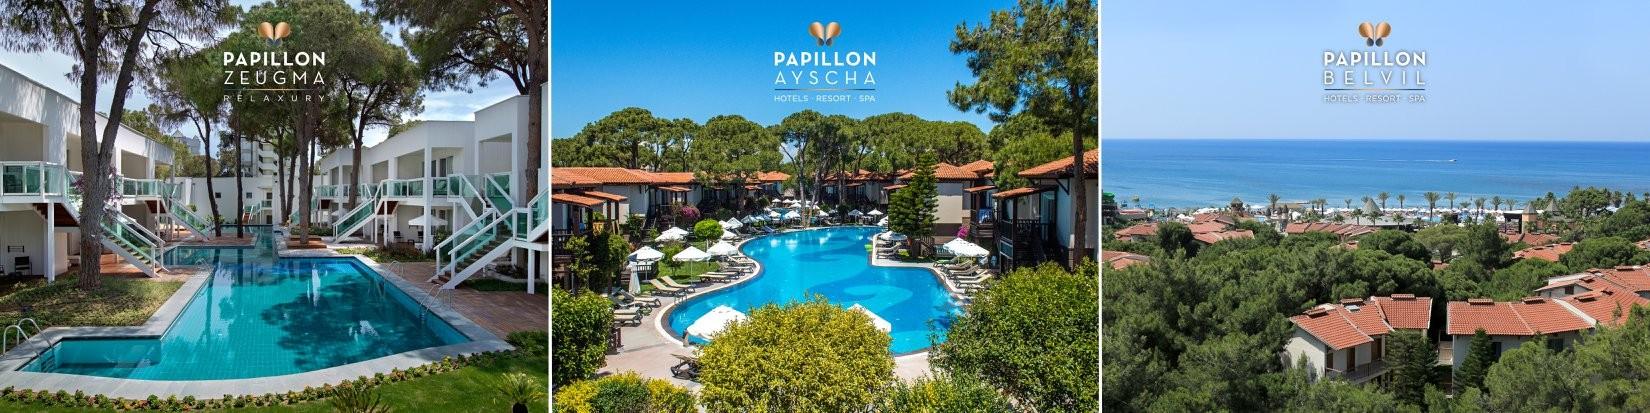 Papillon ayscha or zeugma. Papillon Zeugma Hotel Belek Antalya hpv high risk screening